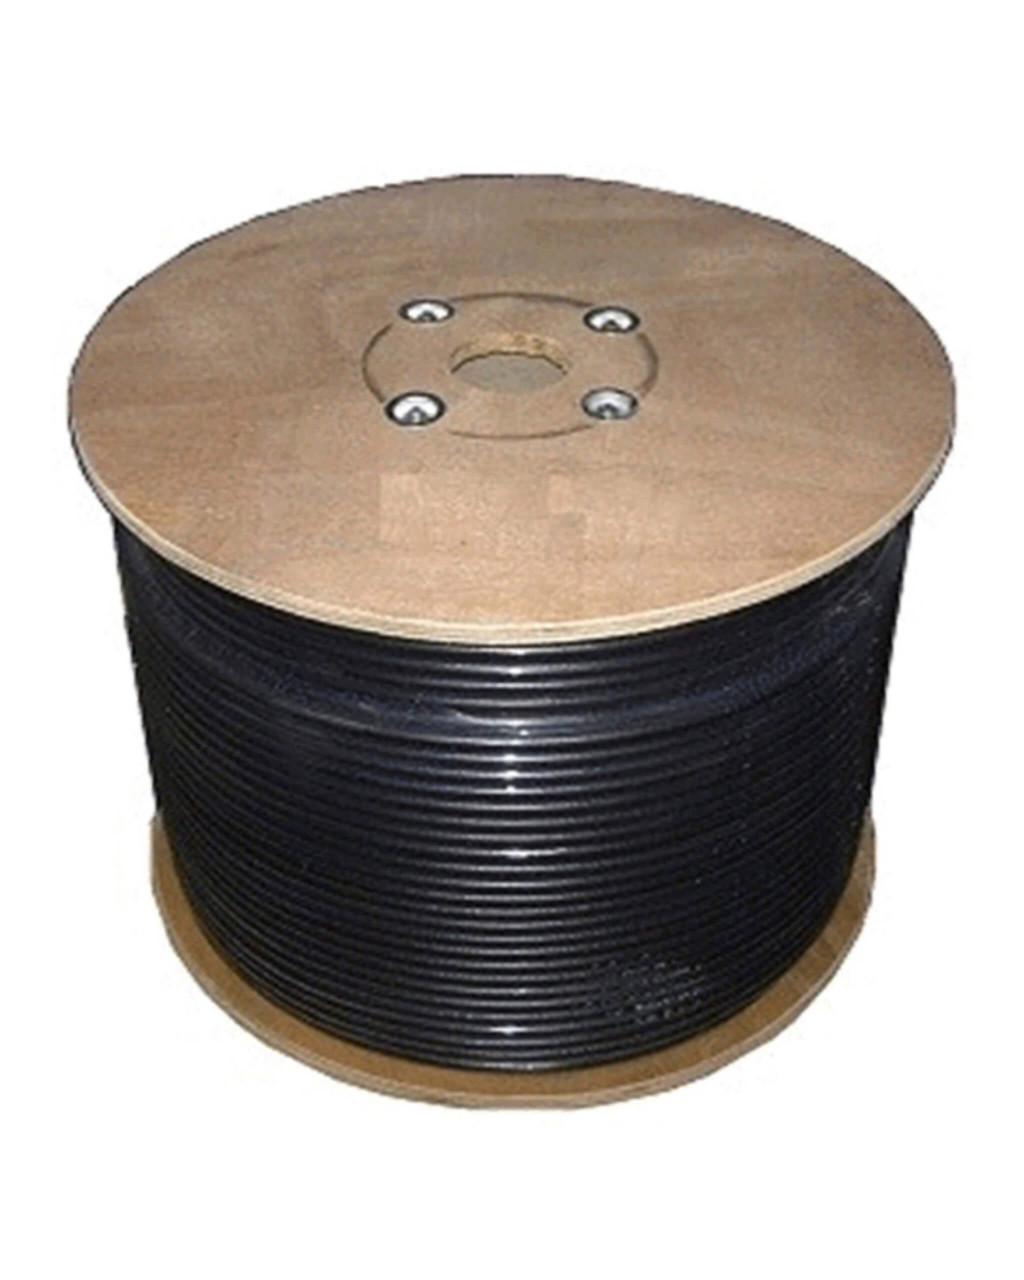 Bolton 240 Low Loss Cable Black Spool No Connector 150m